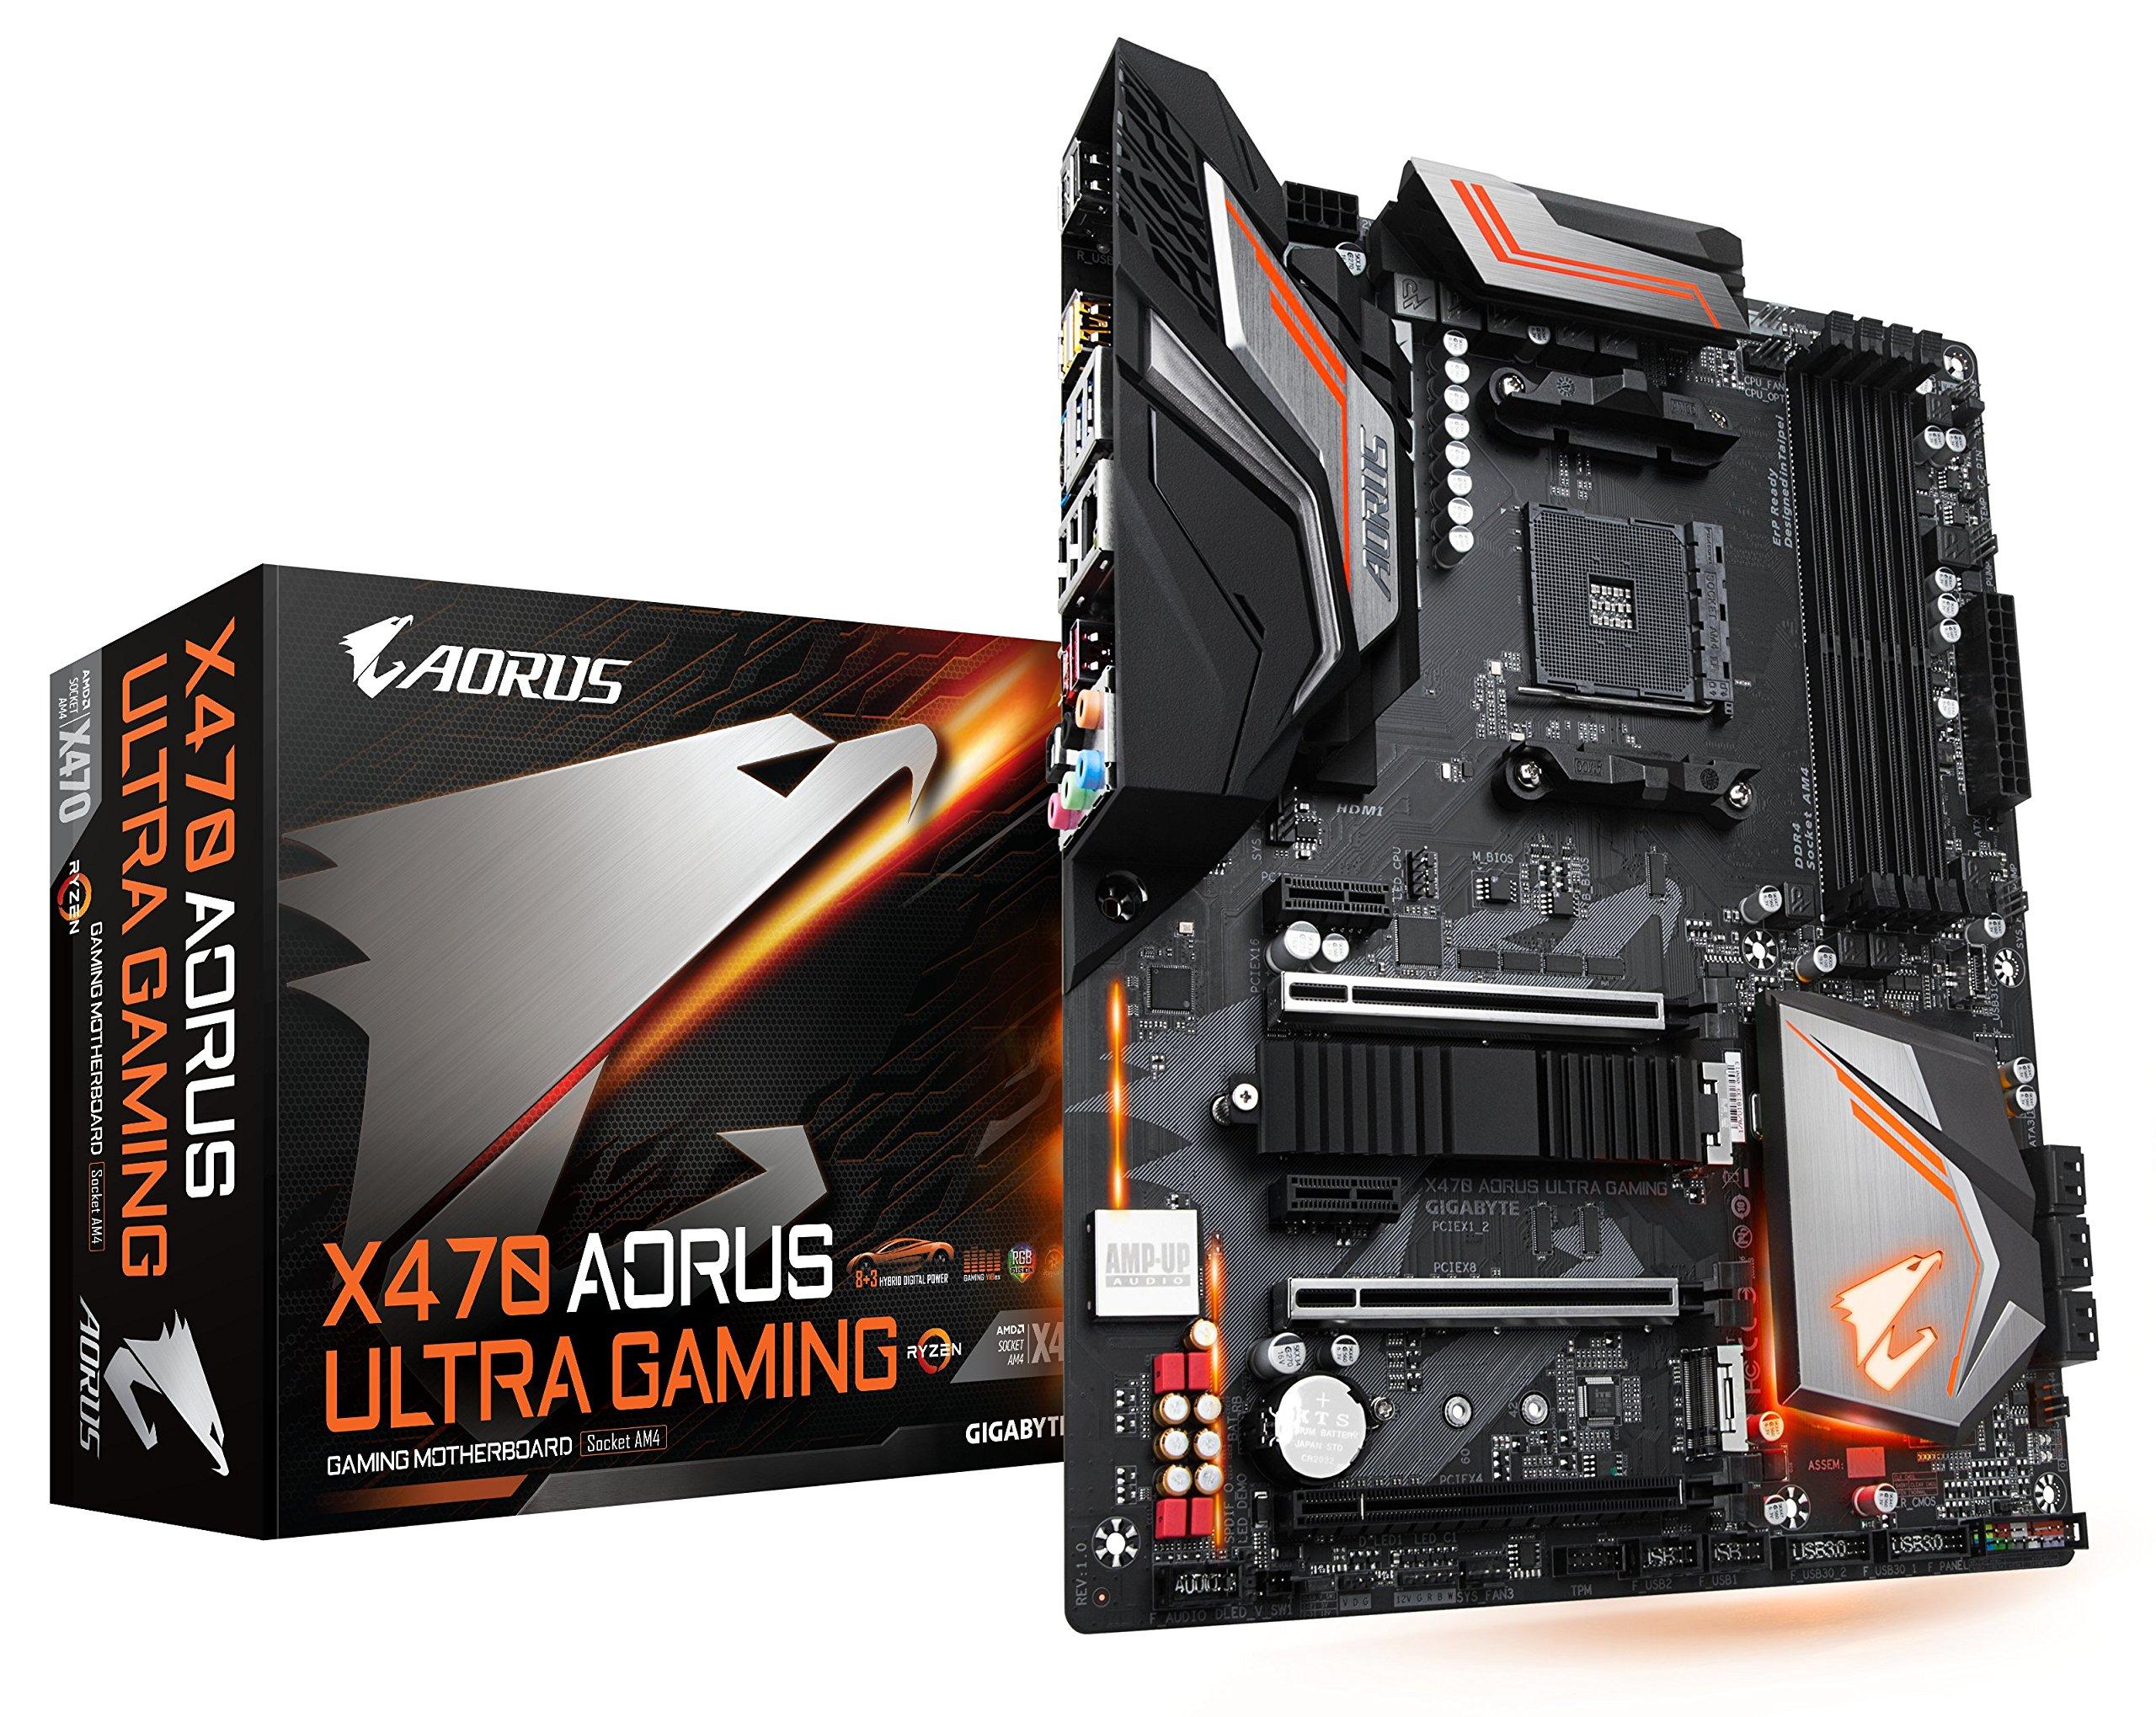 GIGABYTE X470 AORUS ULTRA GAMING (AMD Ryzen AM4/ X470/ USB 3.1 Gen 2 Front Type C/ ATX/ DDR4/ Motherboard)